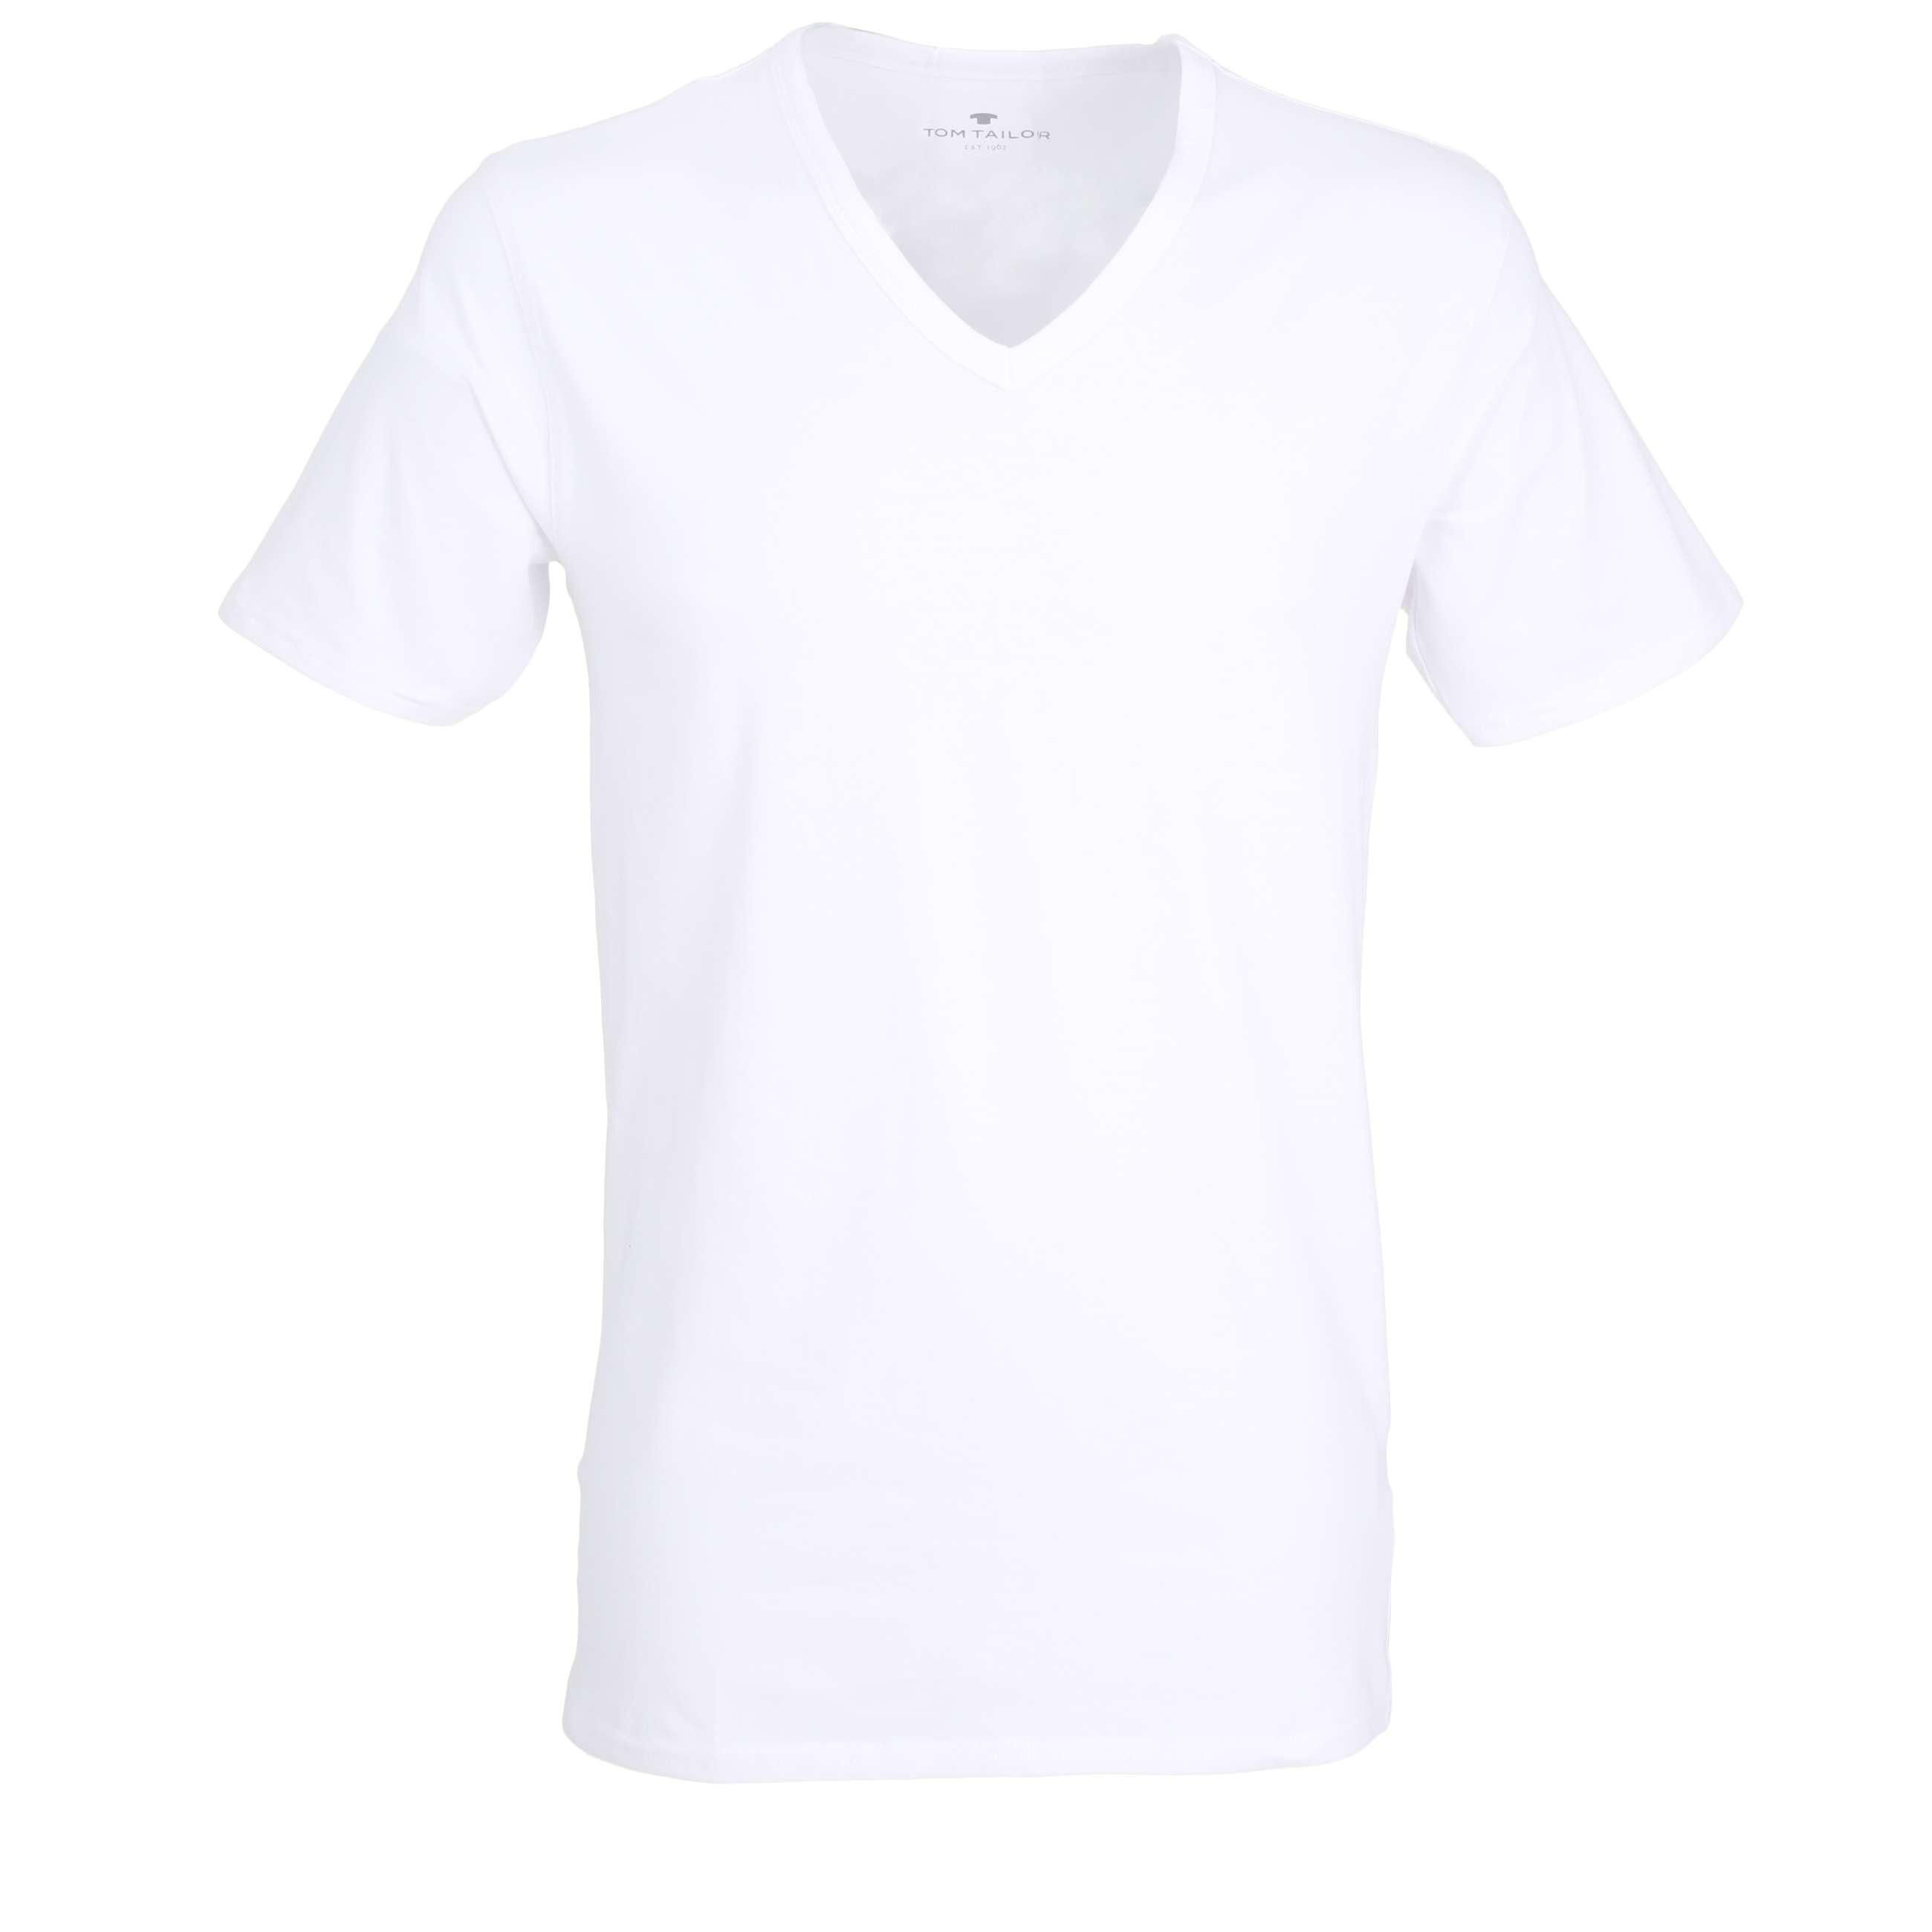 tom tailor herren t shirt freizeit shirt wei uni 2er set. Black Bedroom Furniture Sets. Home Design Ideas